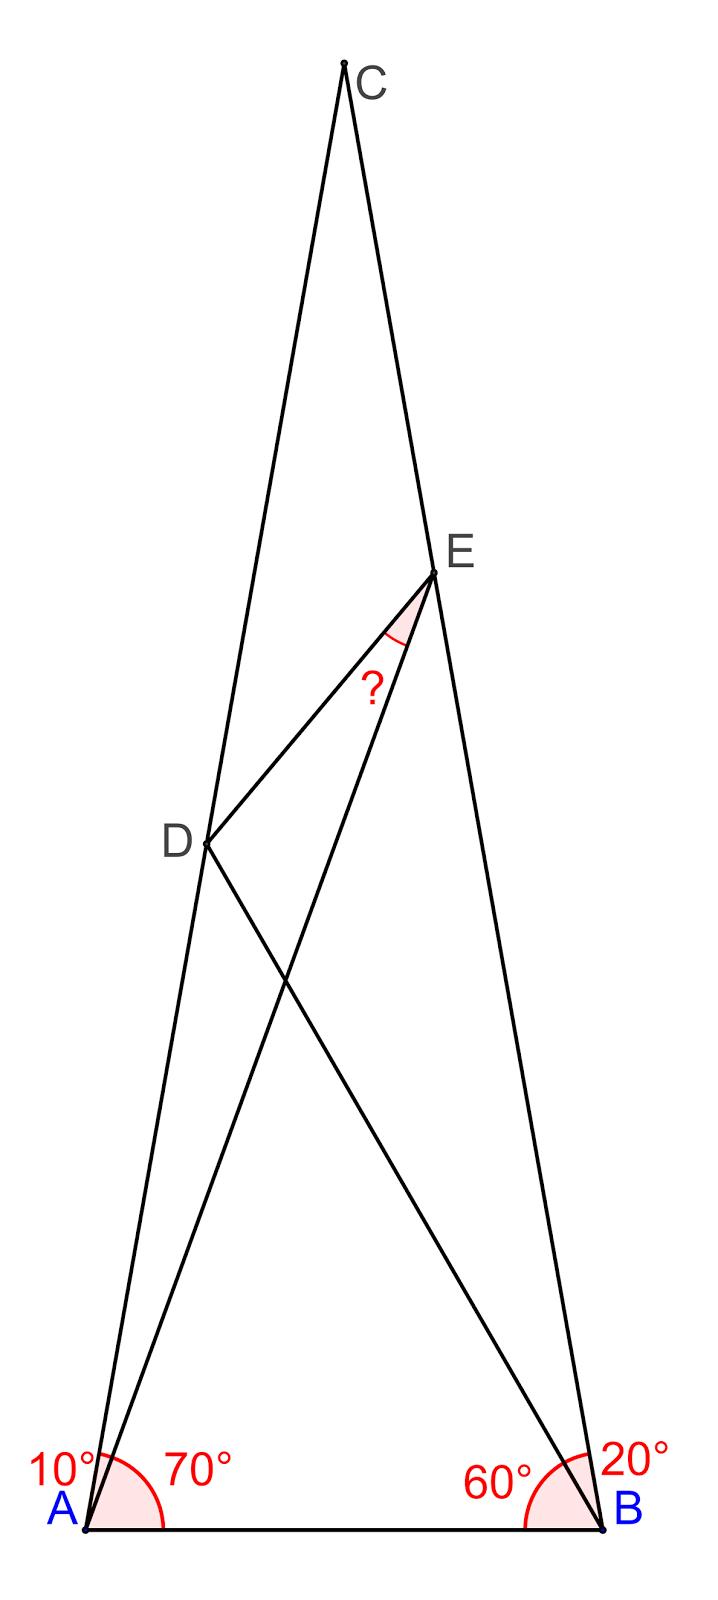 world's hardest easy geometry problem | math | geometry problems